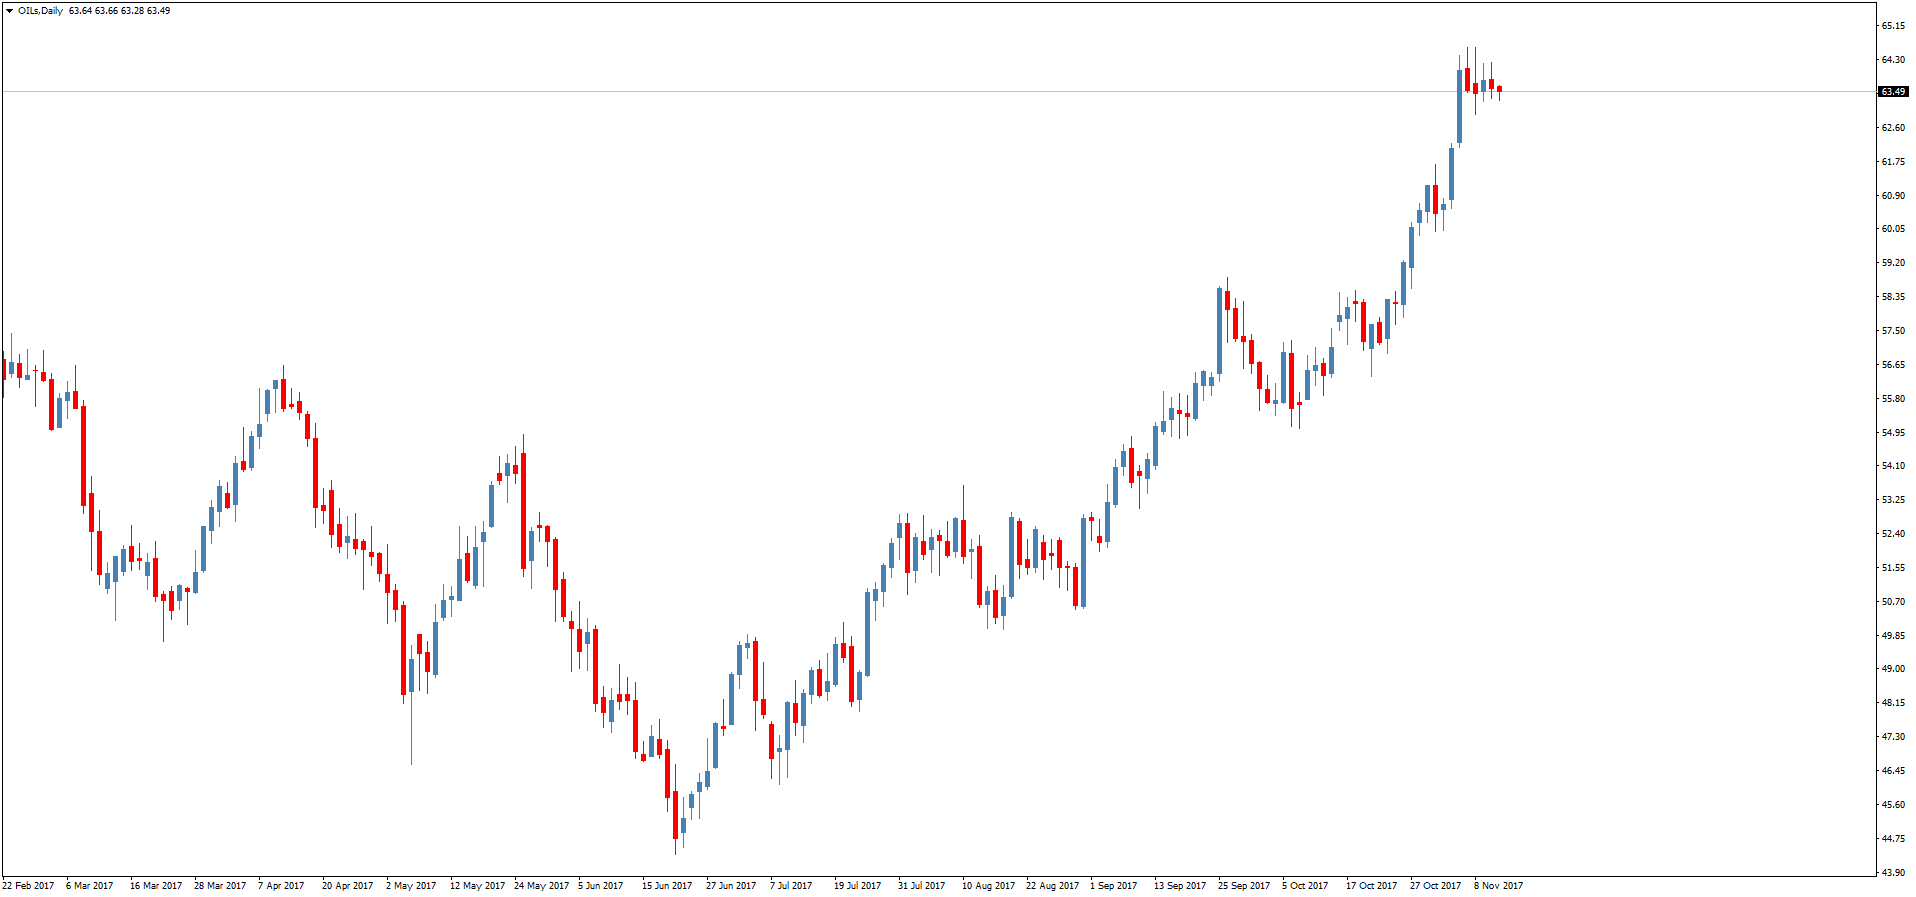 Готовимся к дальнейшему падению рубля. Курс доллара США к рублю на завтра: 59,1823